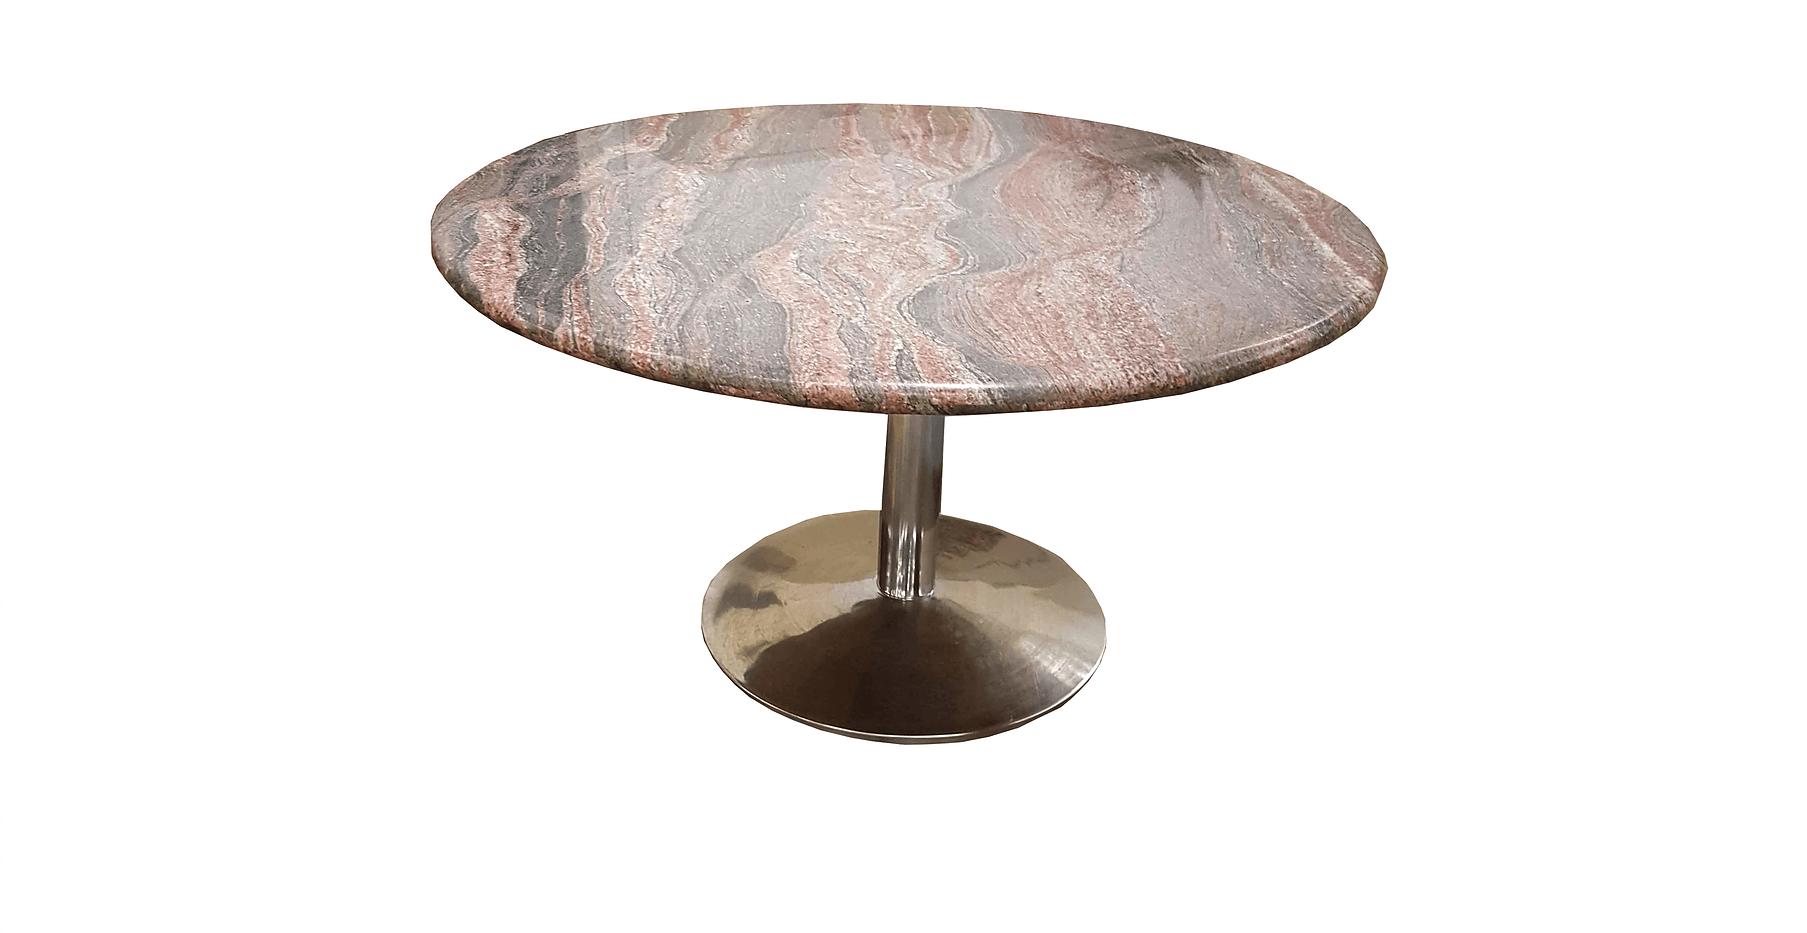 Breakroom Table   DESKS-54GRANITE-ROUNDT